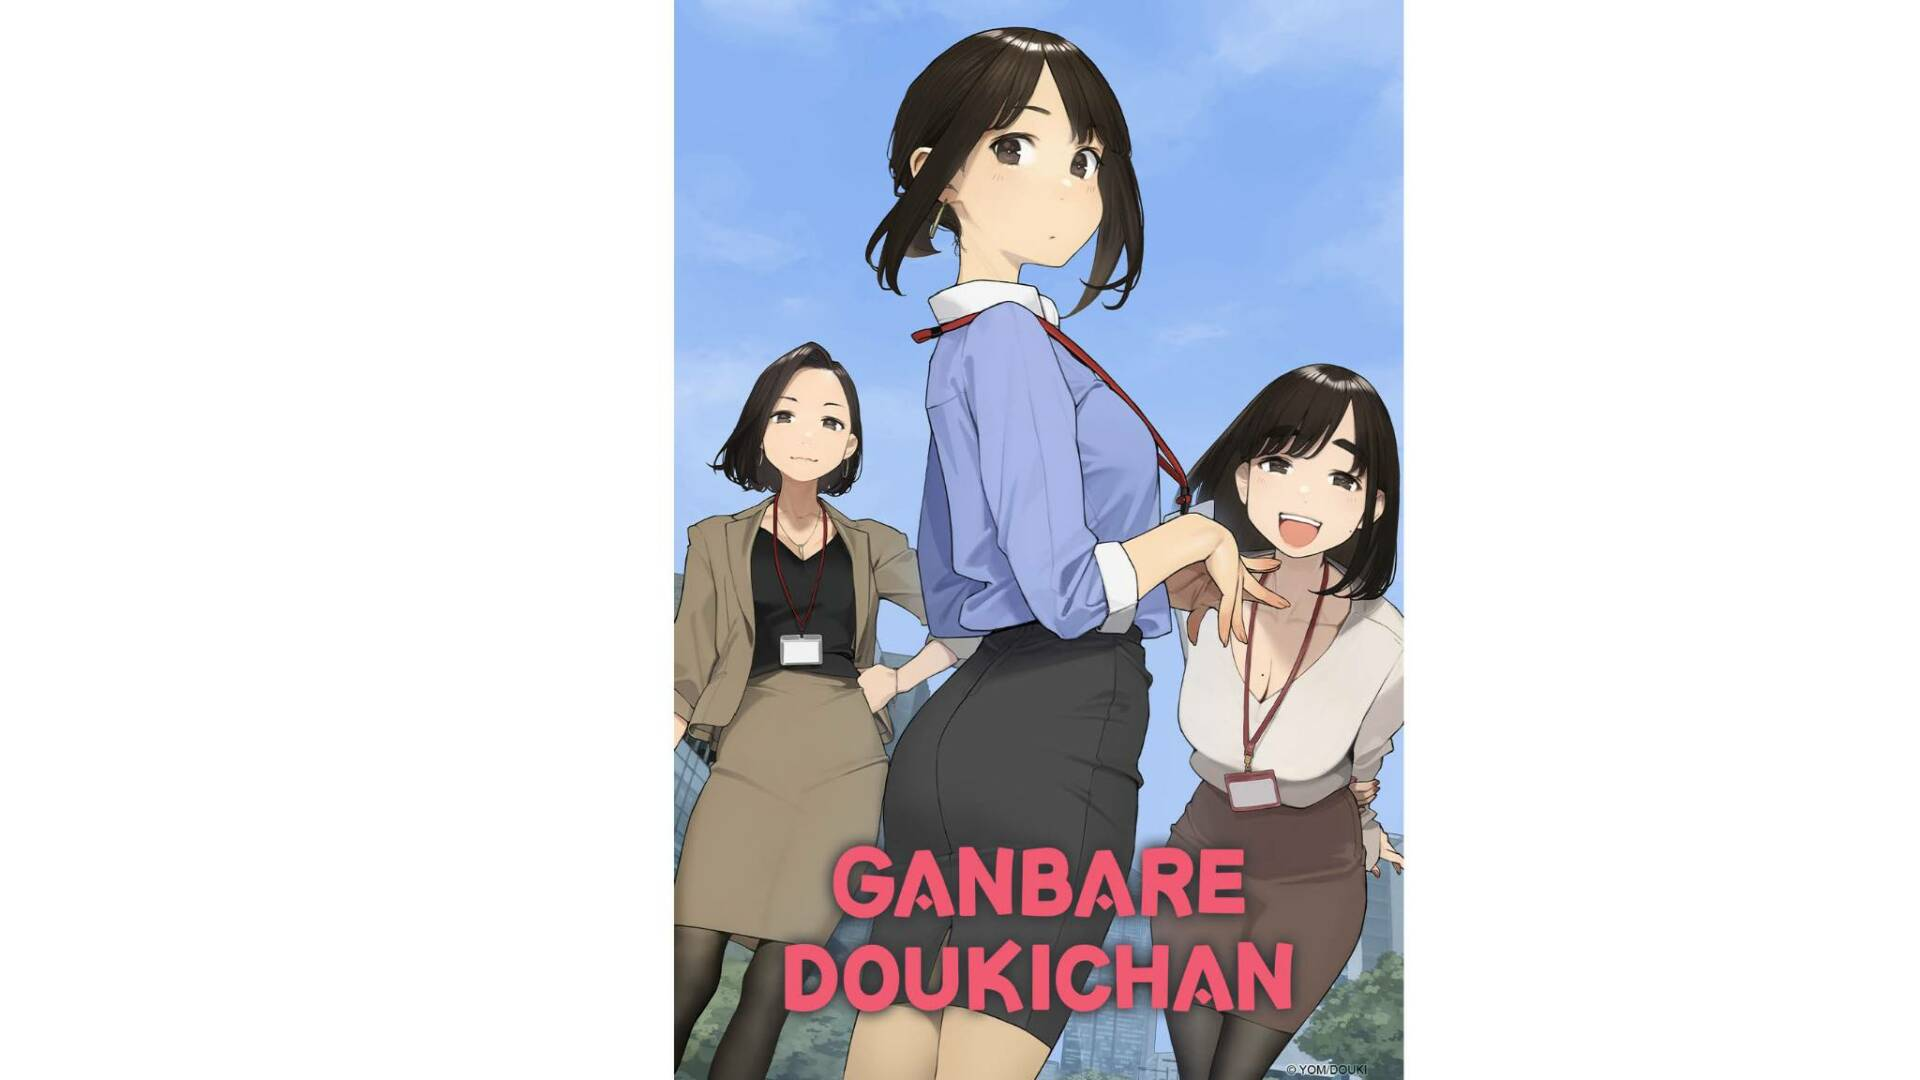 Ganbare Doukichan